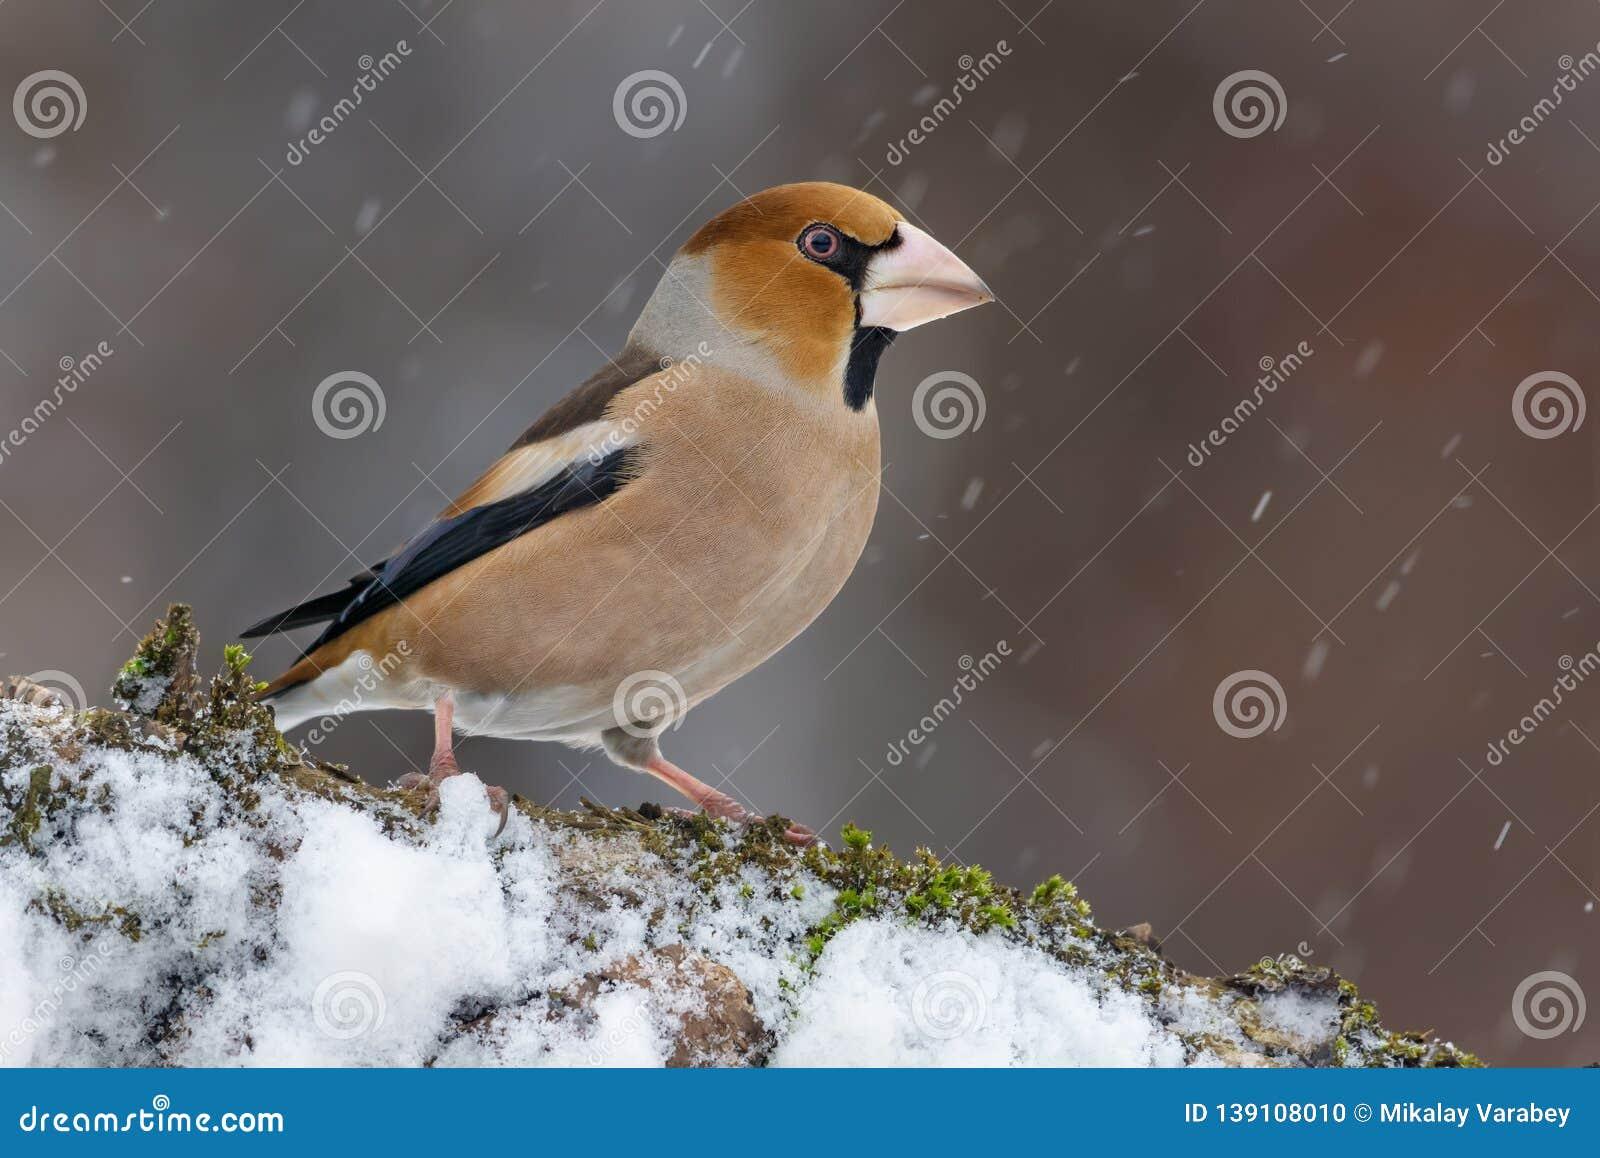 Male hawfinch sitting on a snowy stick in winter snowstorm